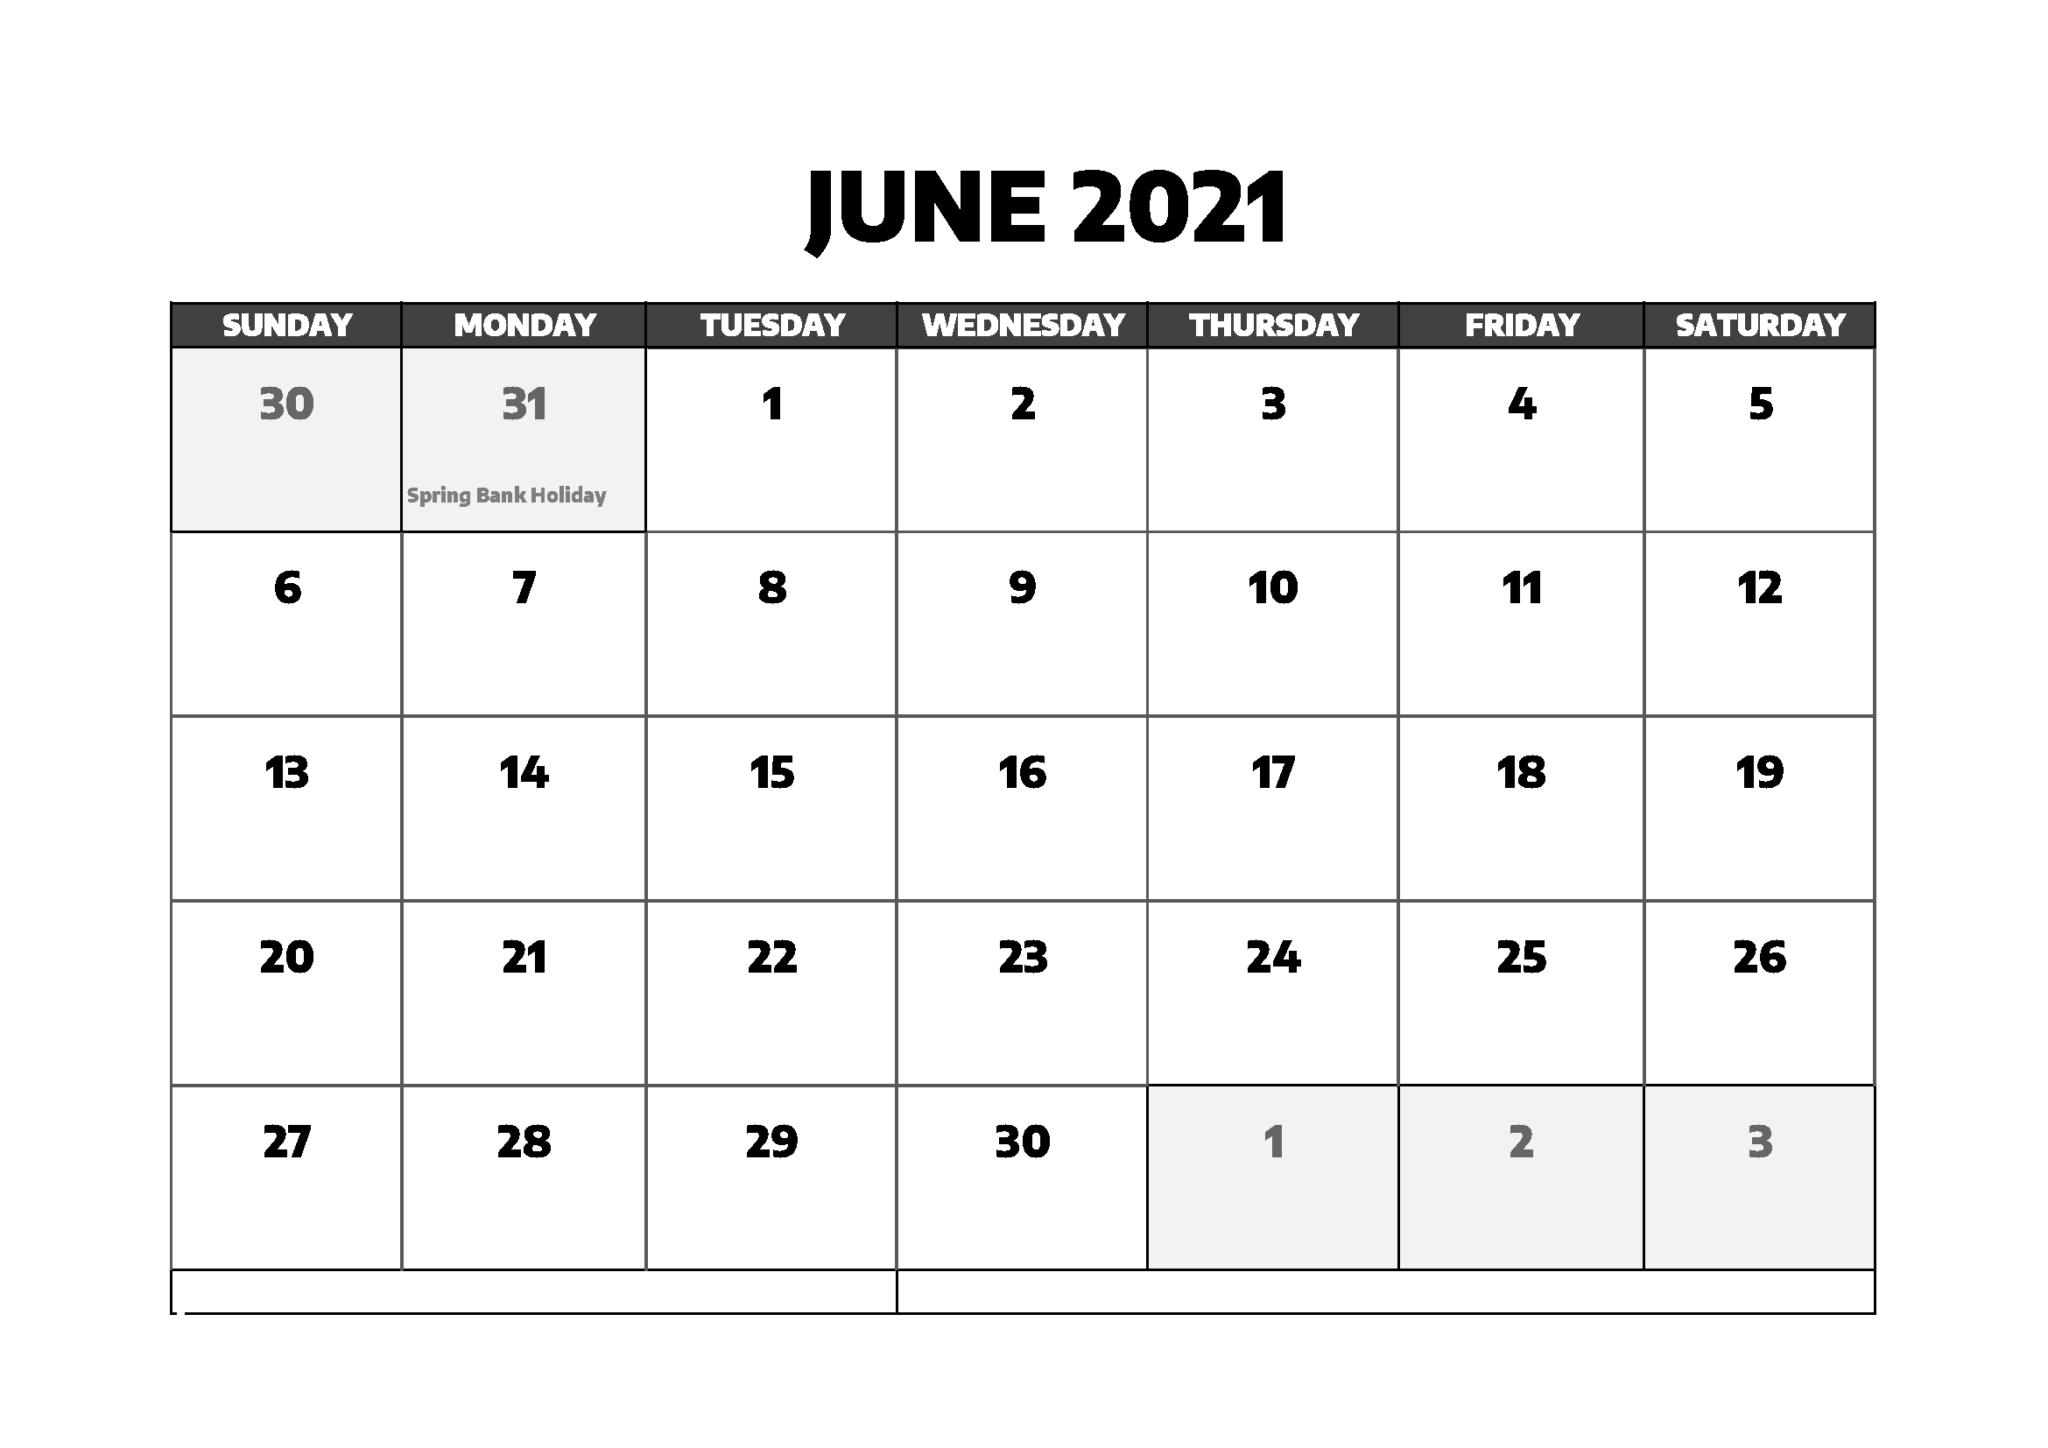 Free June 2021 Calendar With Holidays - Thecalendarpedia June 2021 Calendar Holidays